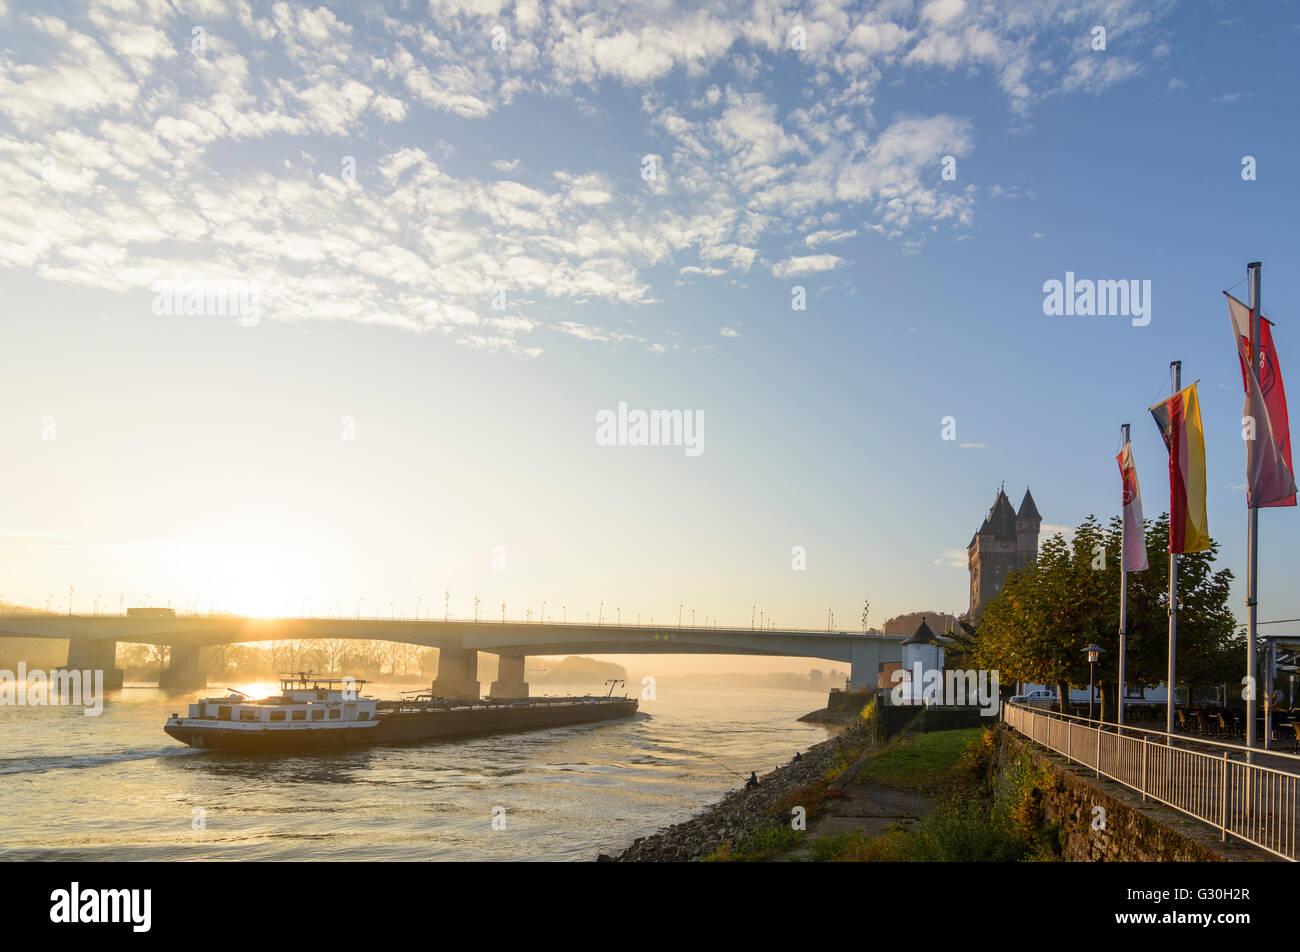 river Rhein (Rhine) at sunrise with Nibelungenbrücke , Nibelungen tower , cargo ship, Germany, Rhineland-Palatinate, - Stock Image